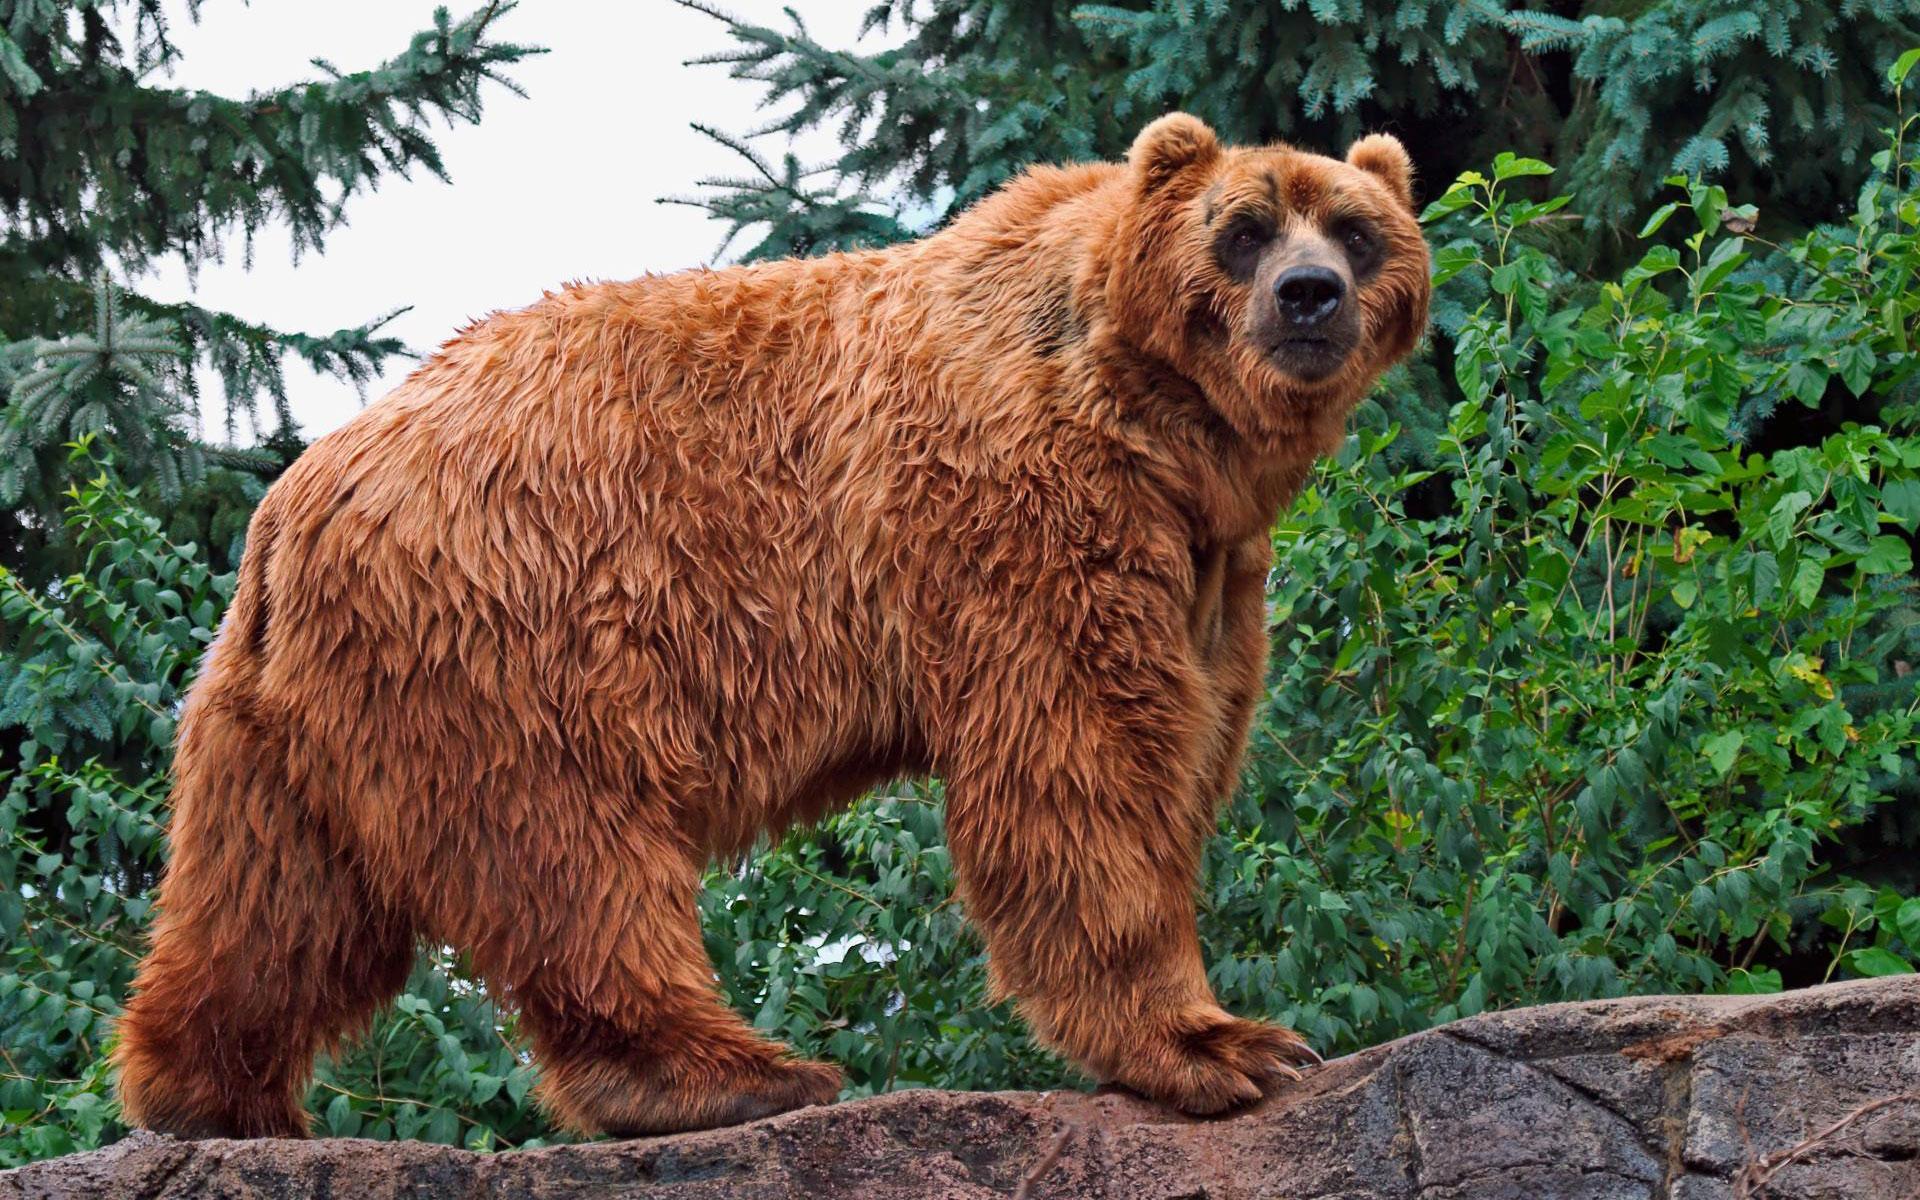 HD Wallpapers Kodiak Bear